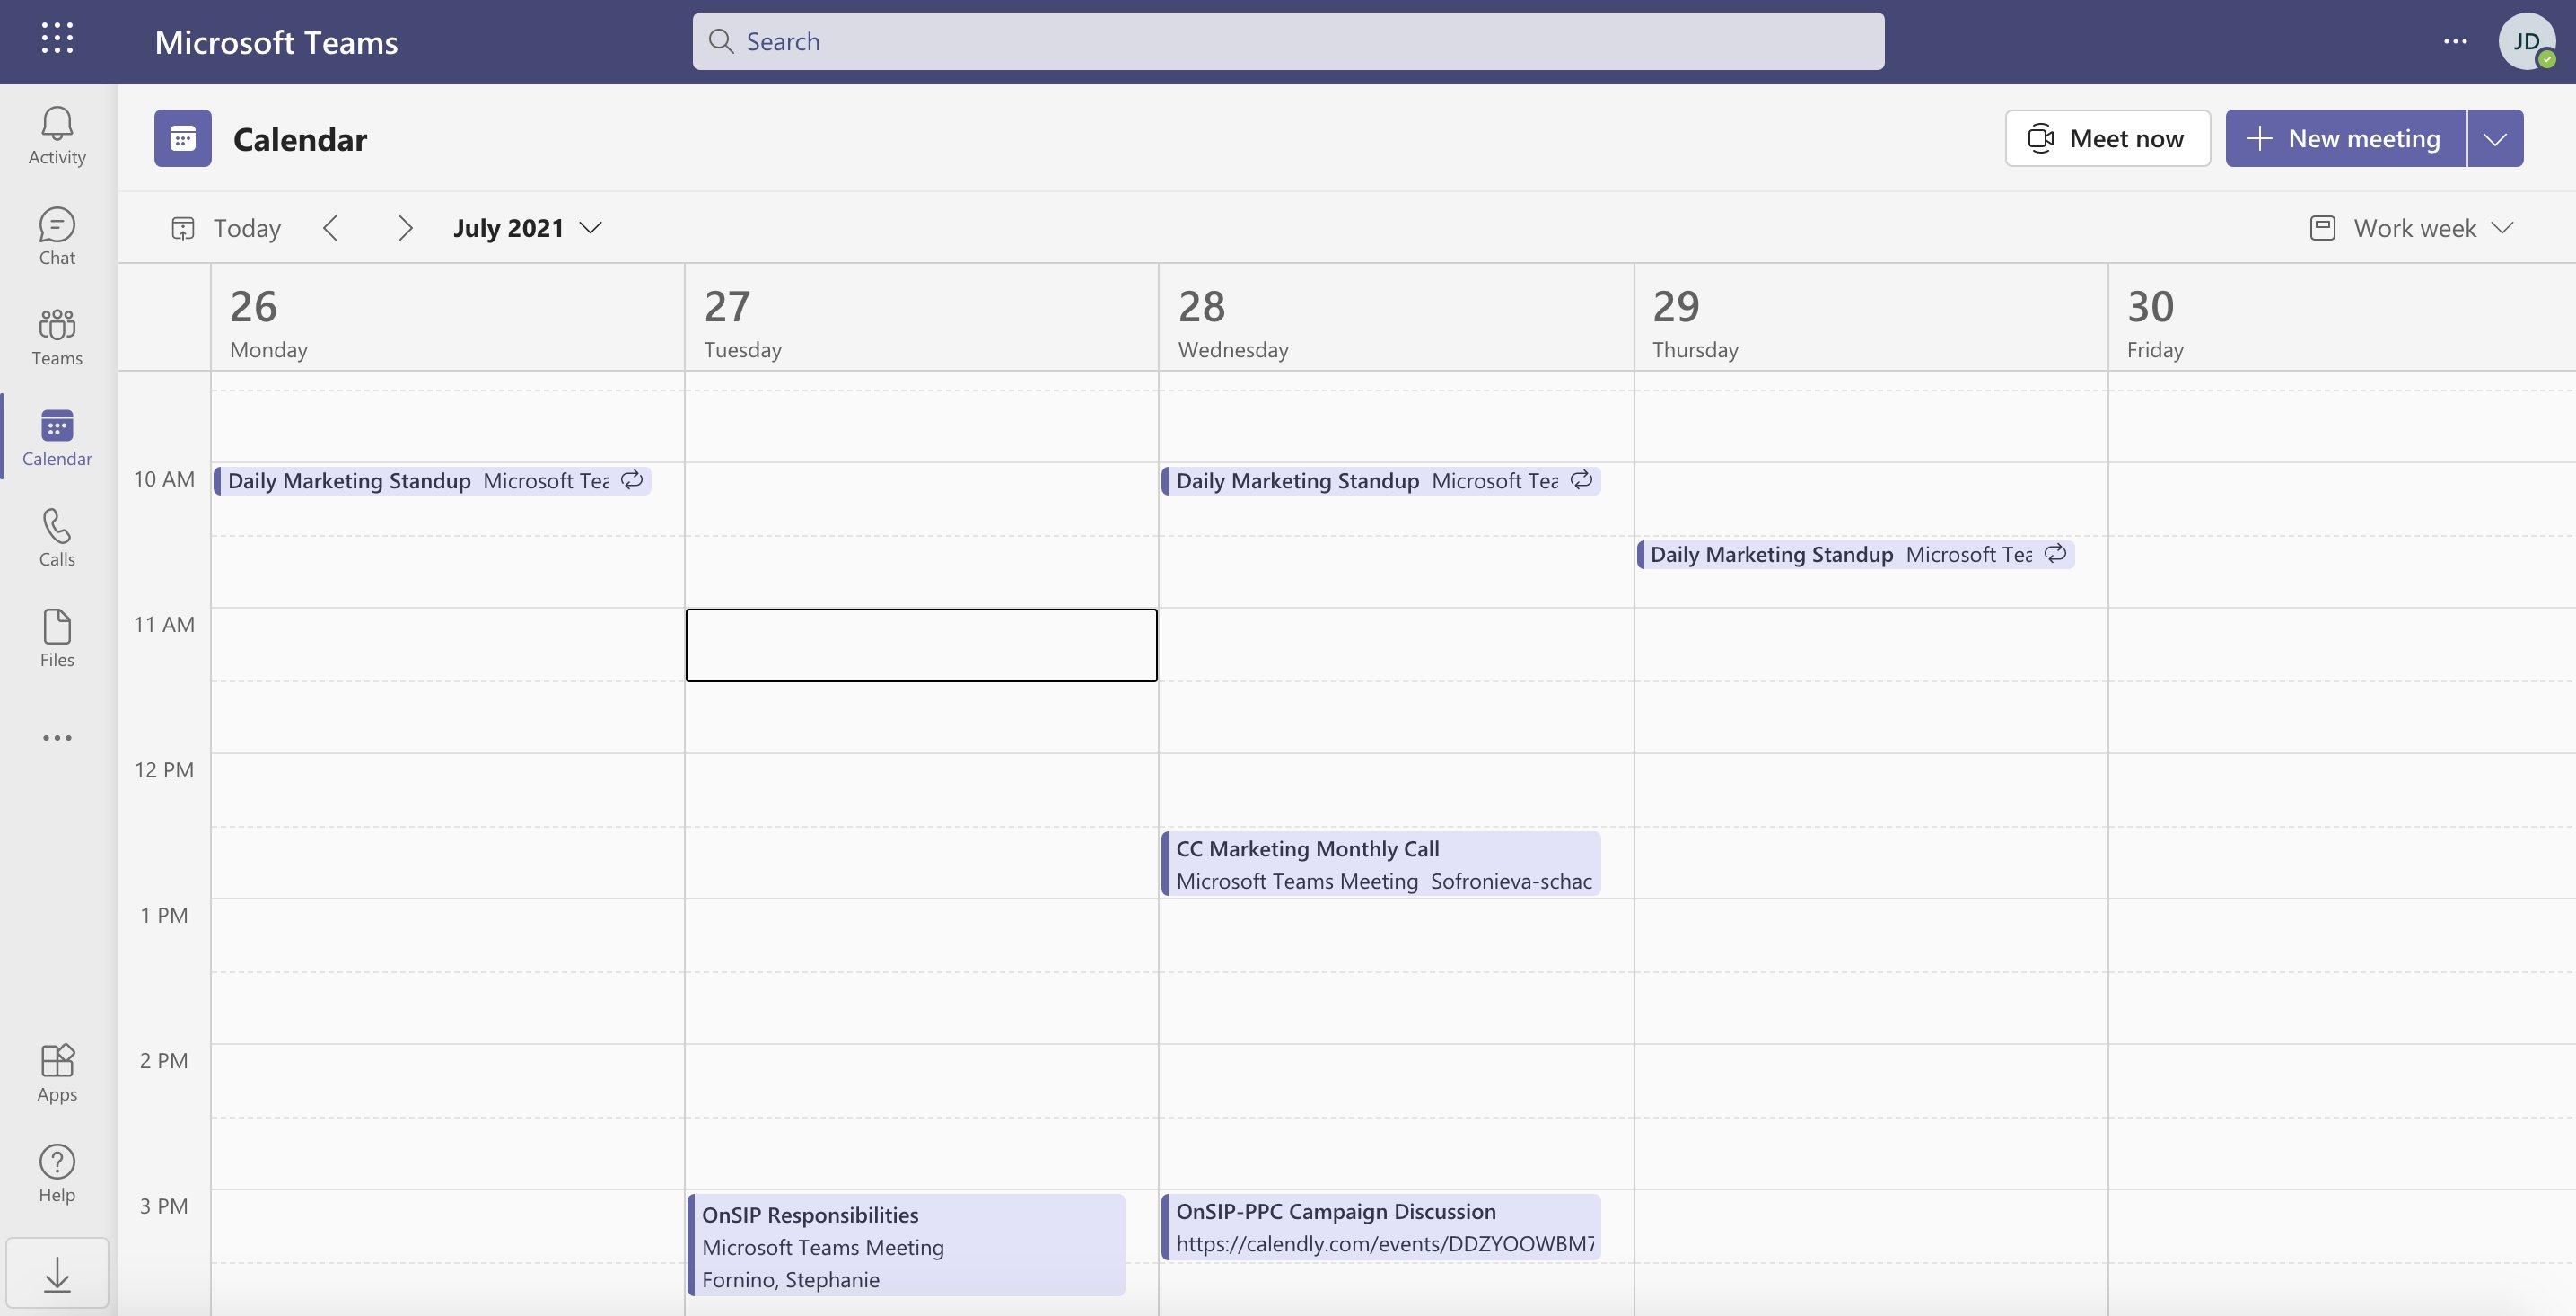 Calendar view in Microsoft Teams.